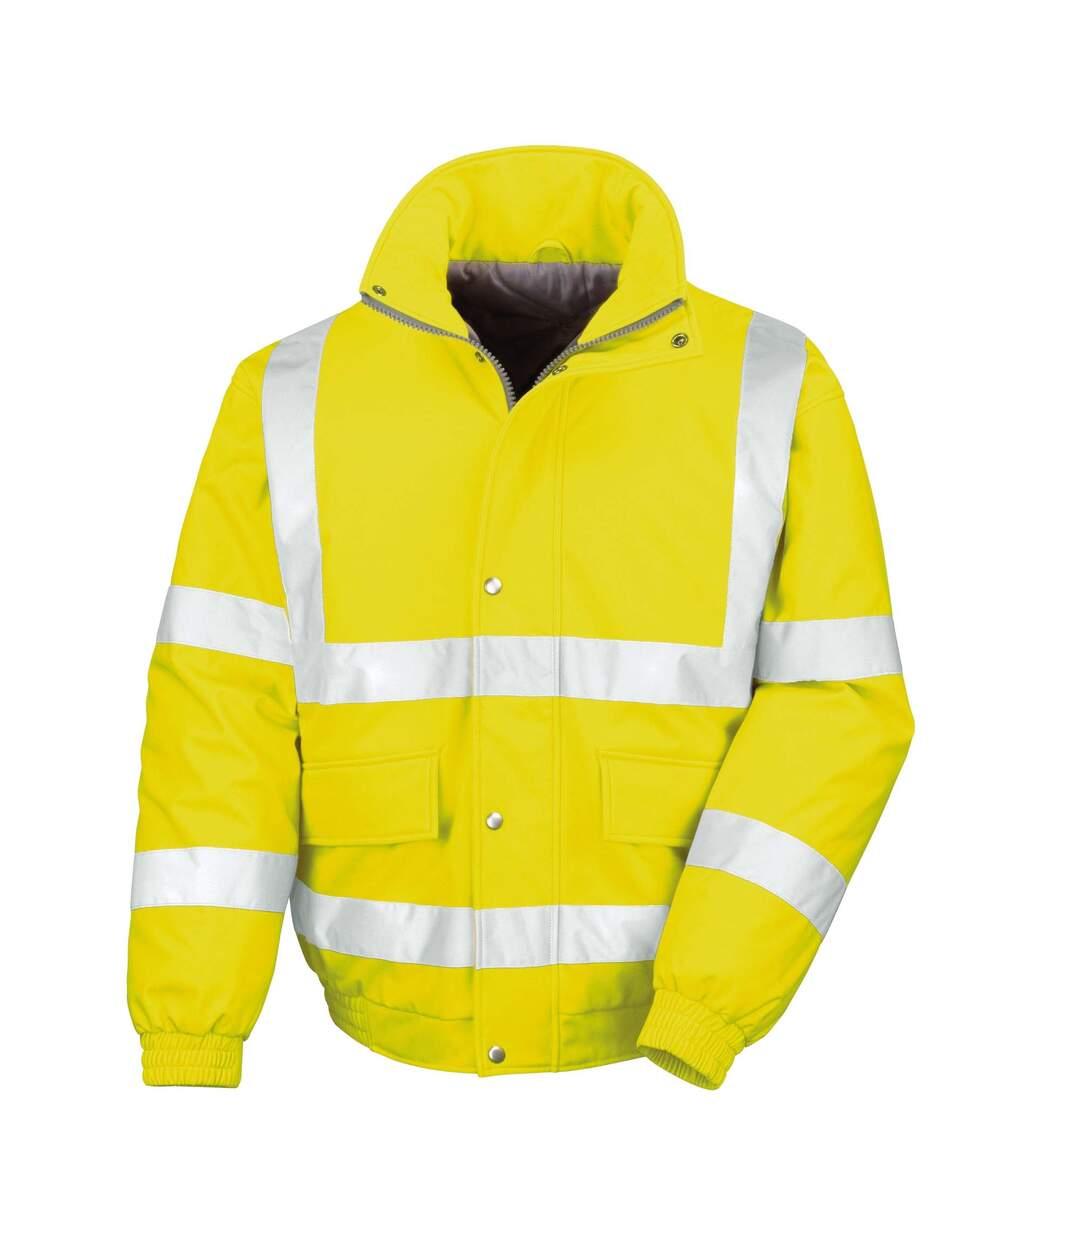 Result Mens Reflective Safety Padded Softshell Blouson Jacket (Yellow) - UTRW4849